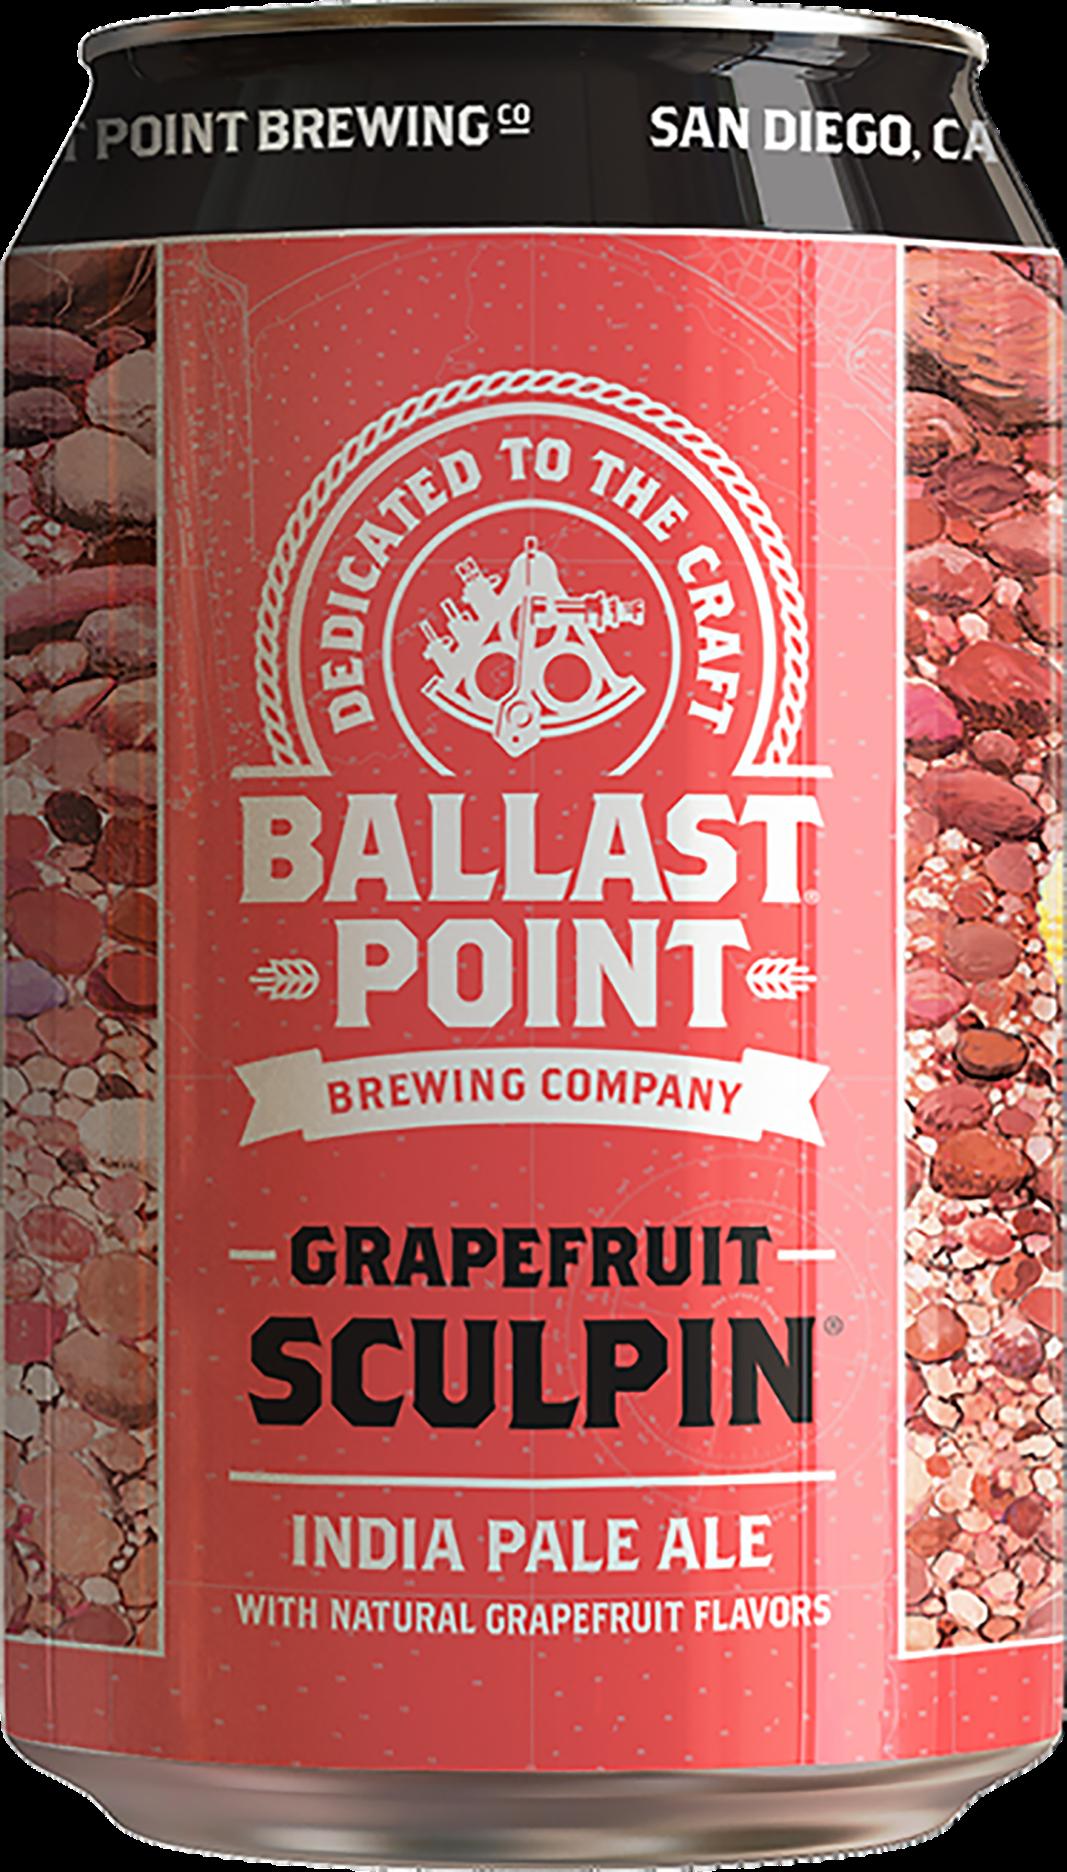 BallastPoint_GrapefruitSculpin_can